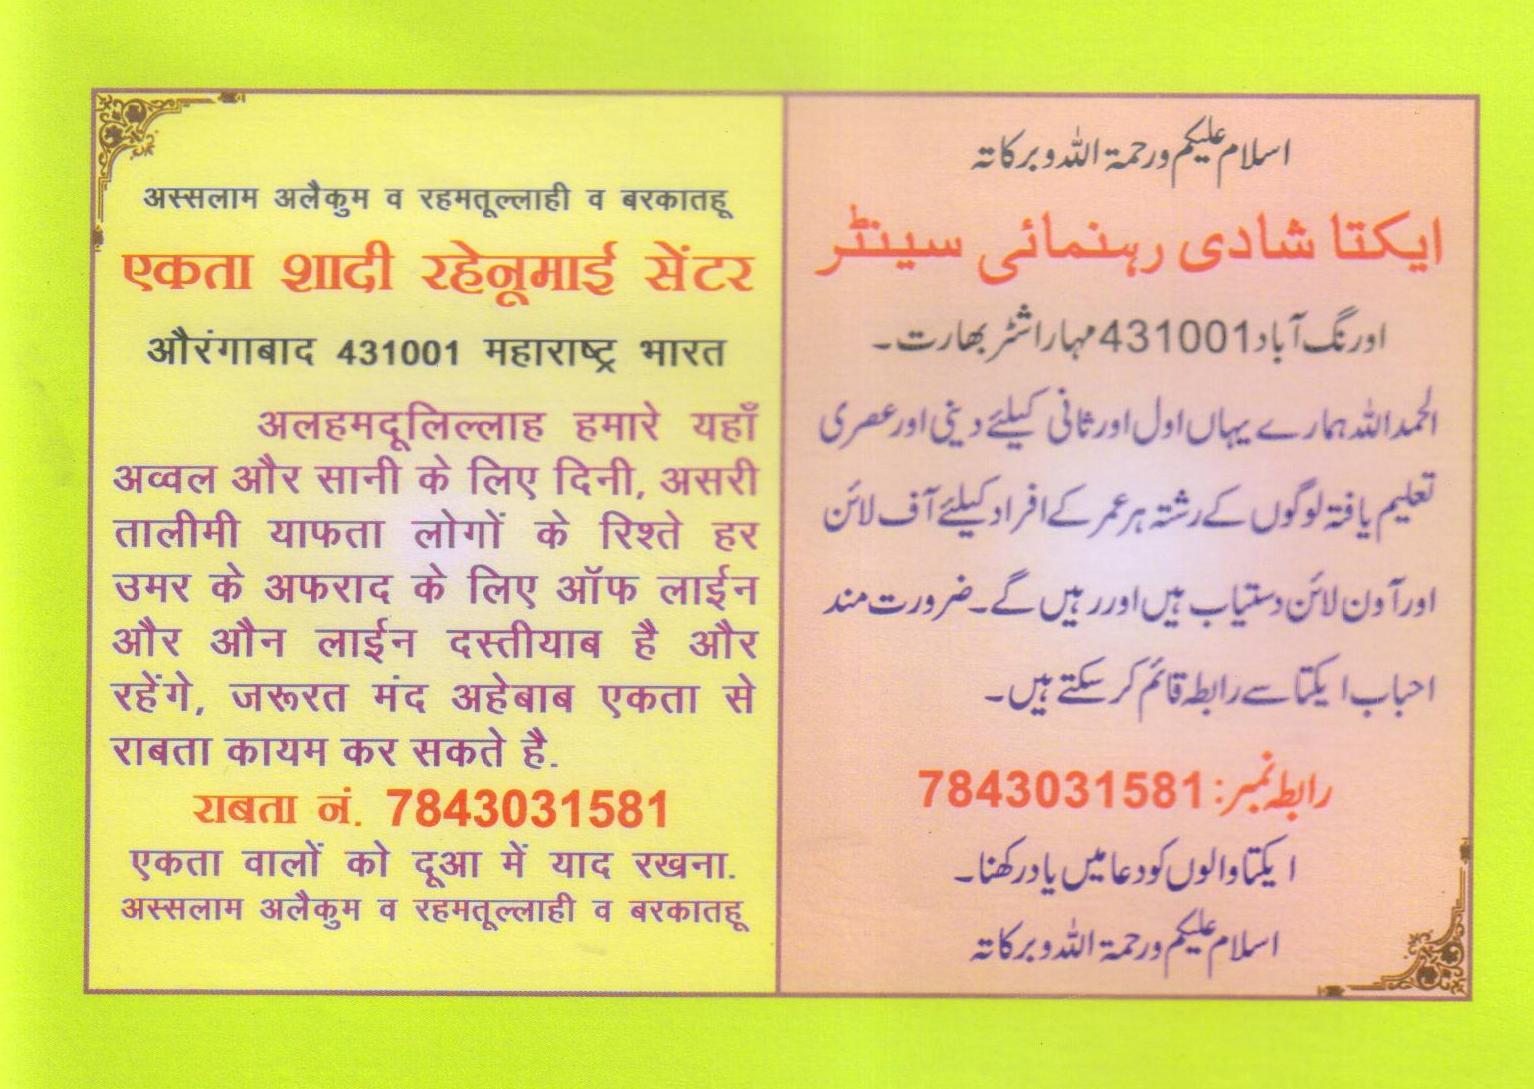 Ekta Shaadi Center and Multiservices_image0